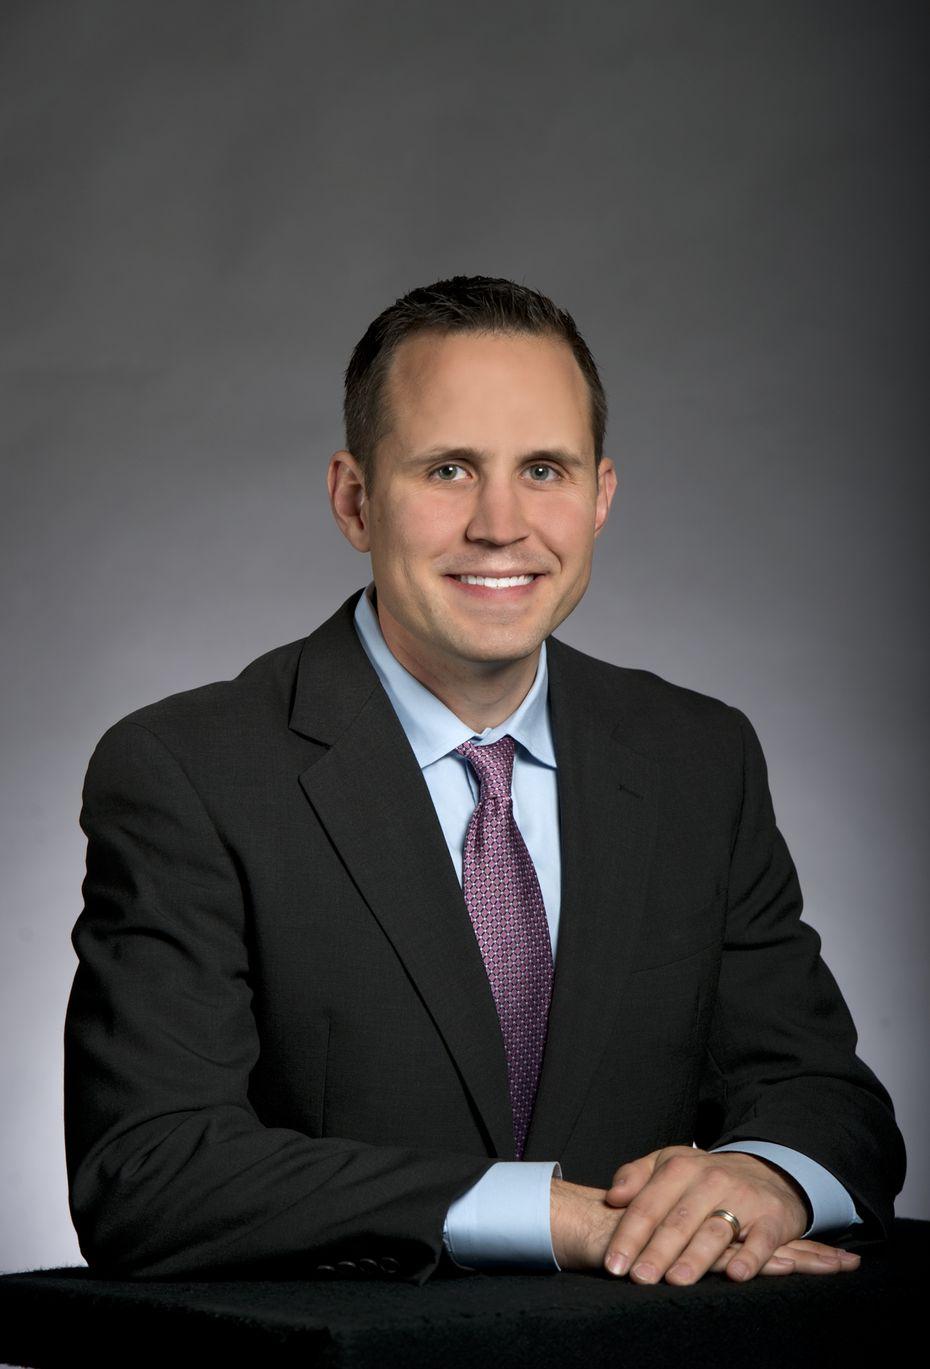 University of North Texas professor Andrew Torget